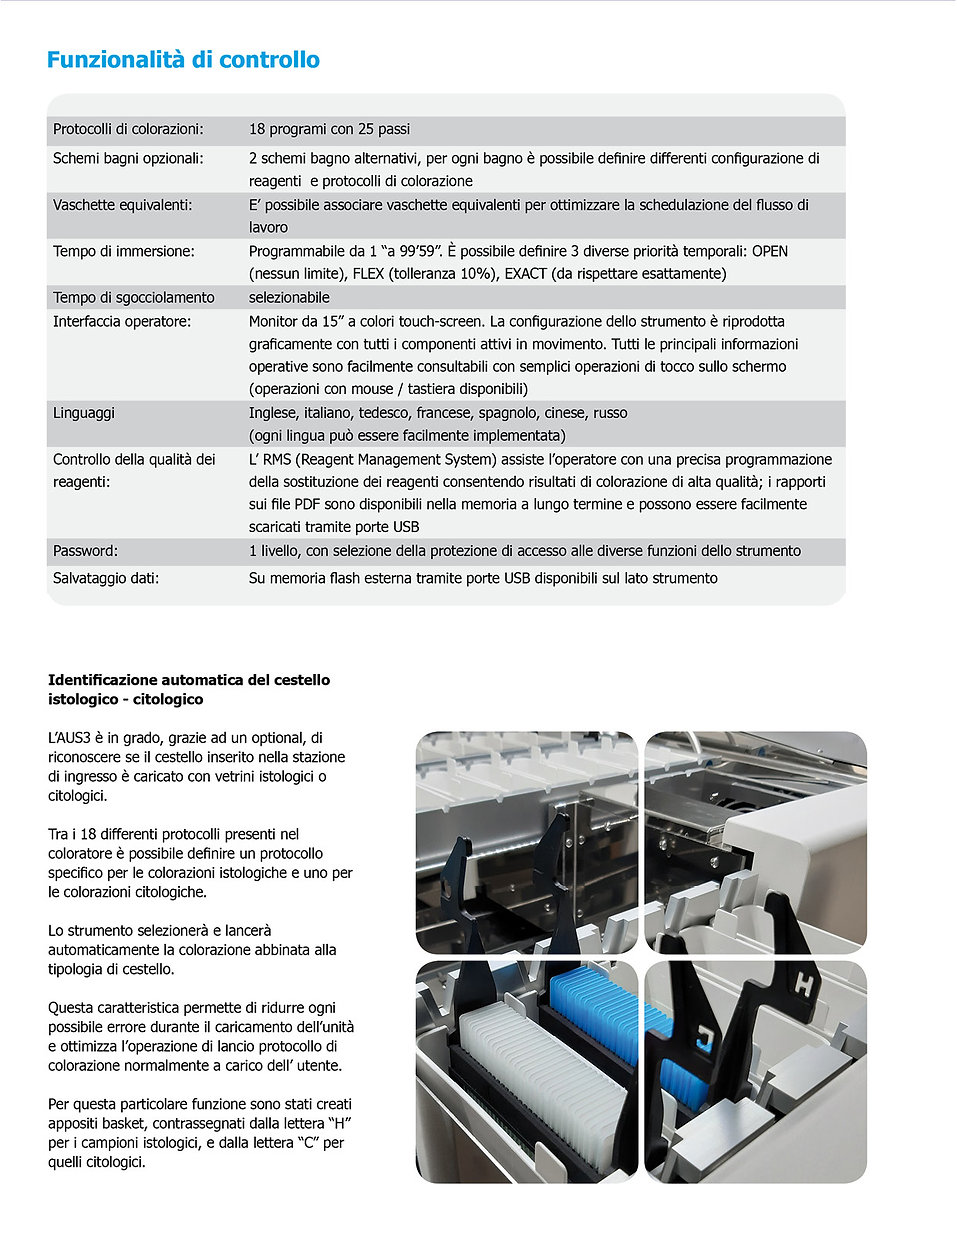 Intelsint Brochure AUS3 IT 202009 A43R.j